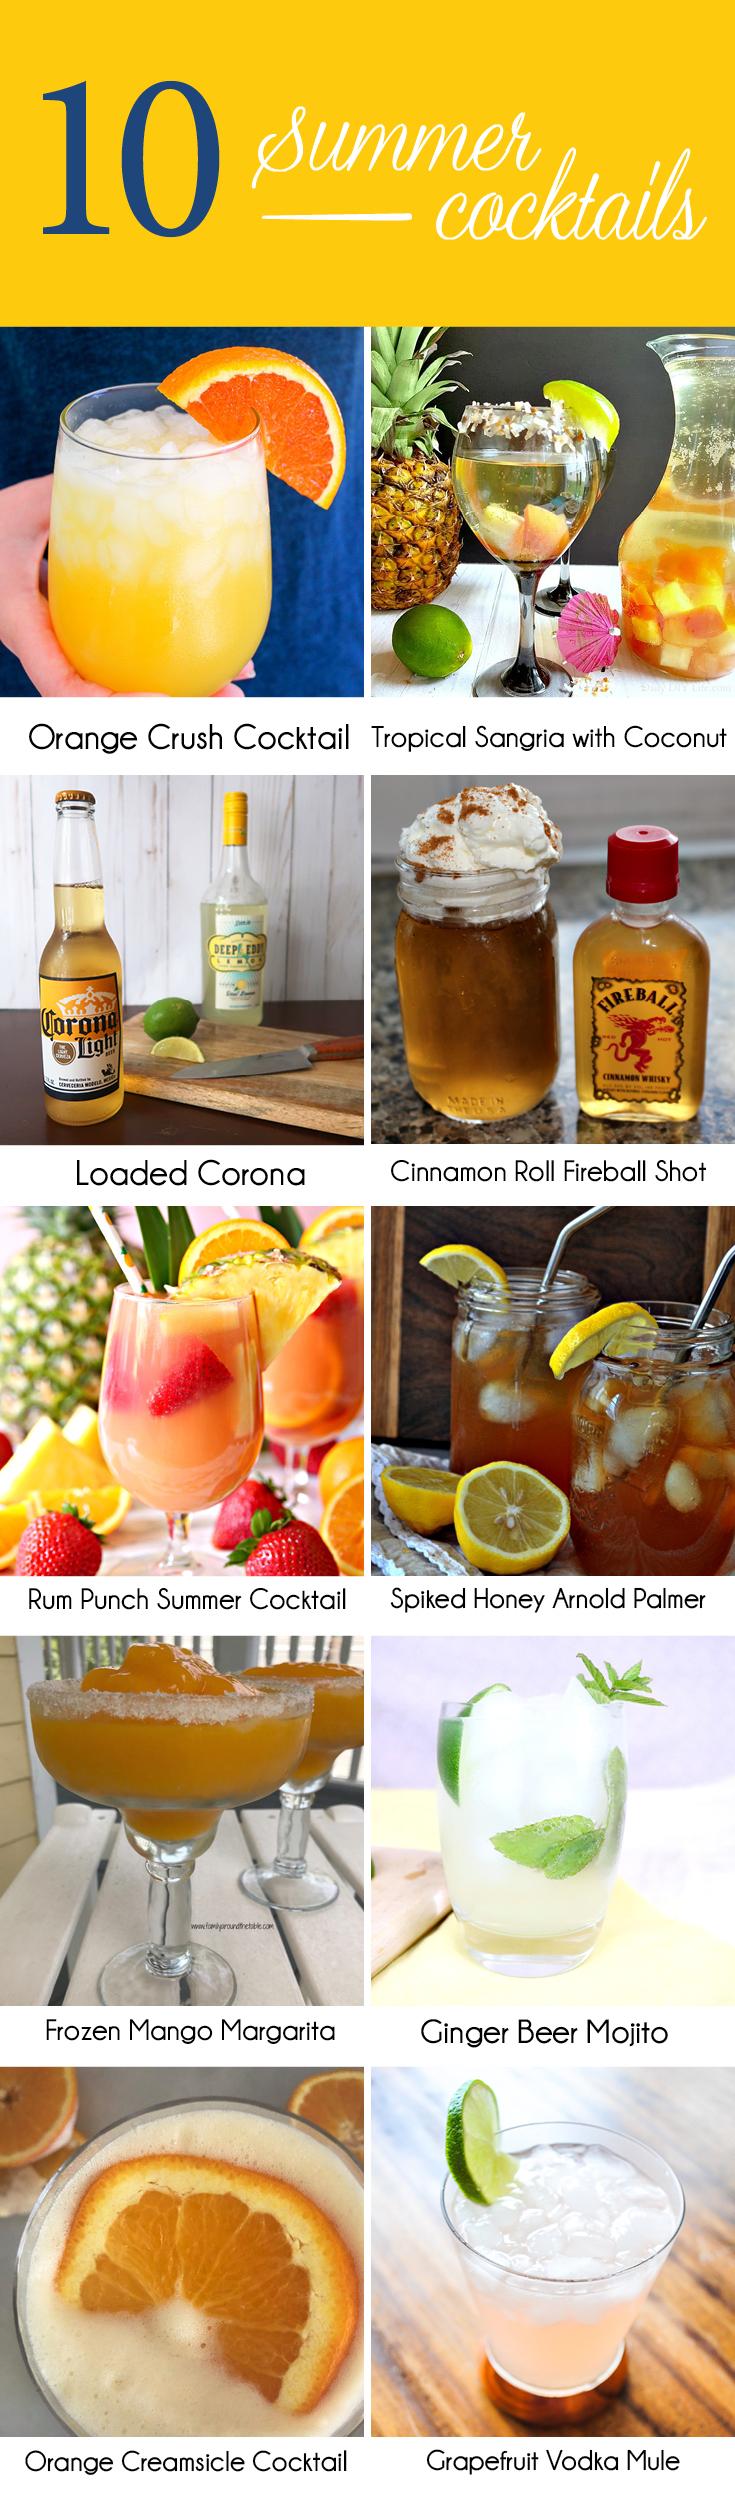 10 Summer Cocktails.jpg